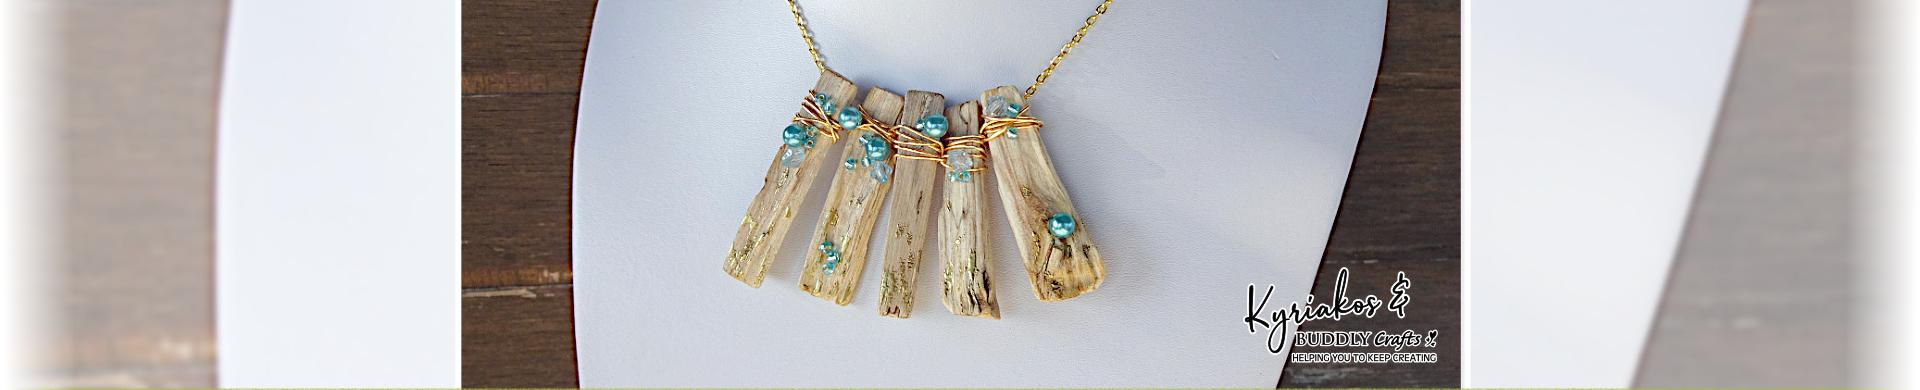 Jewellery & Craft Wires